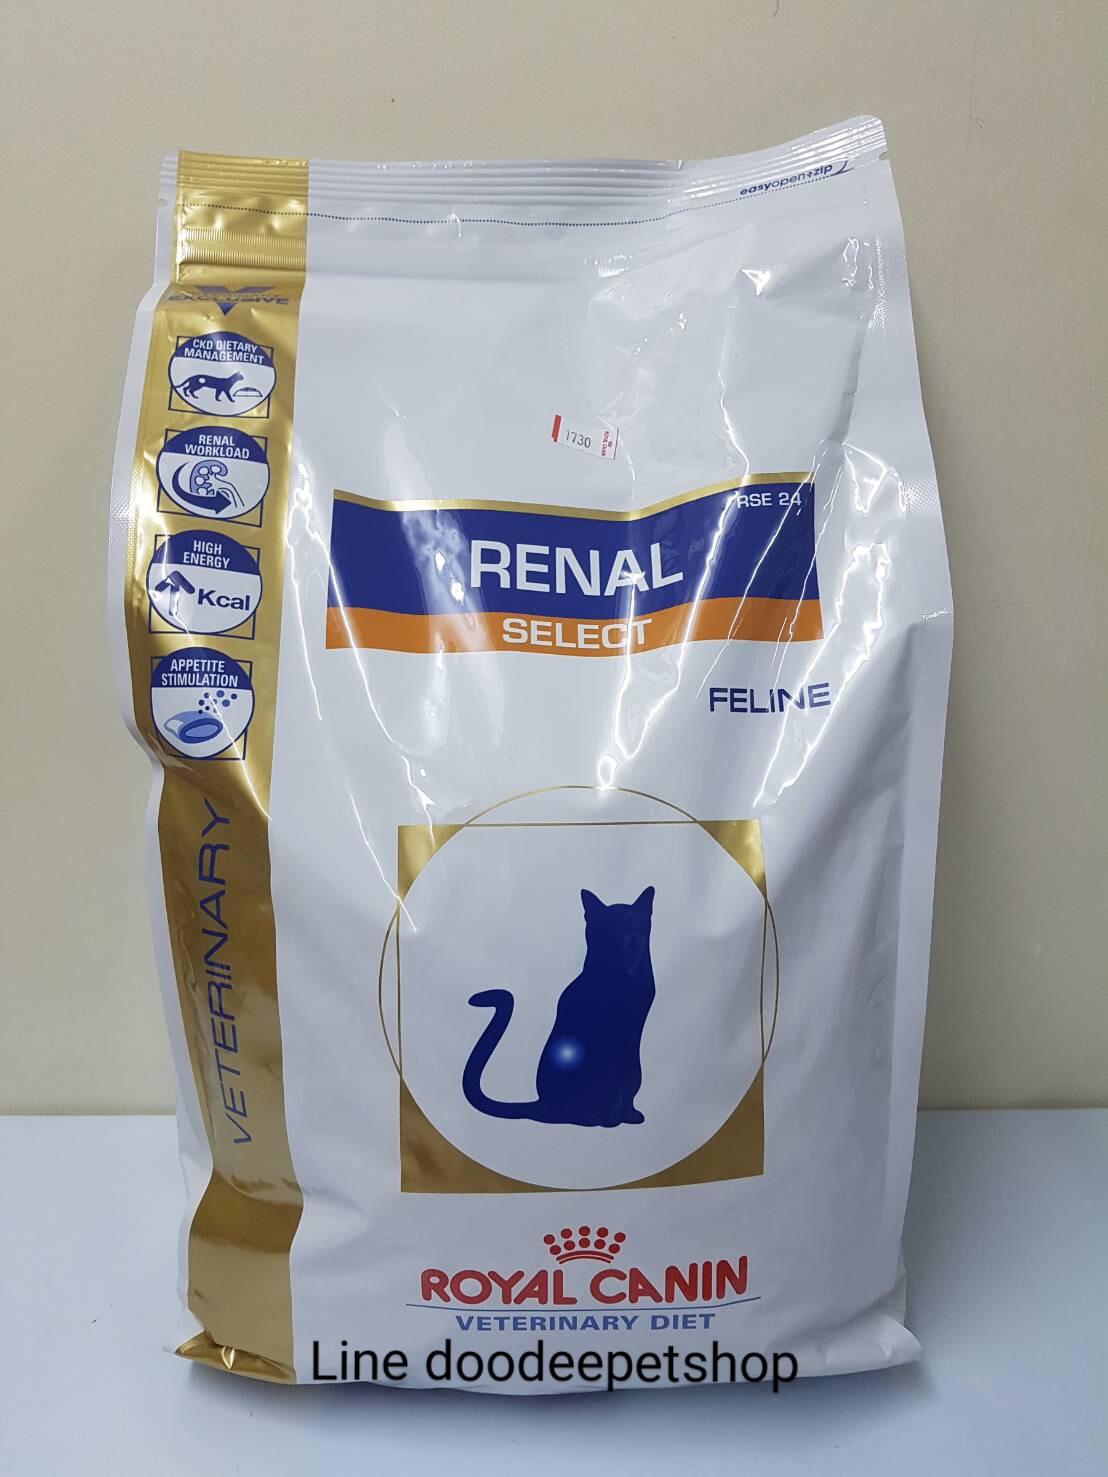 RenalSelect 4 kg.Exp.04/19 แมวโรคไต เม็ดสอดไส้ กรอบนอกนุ่มใน